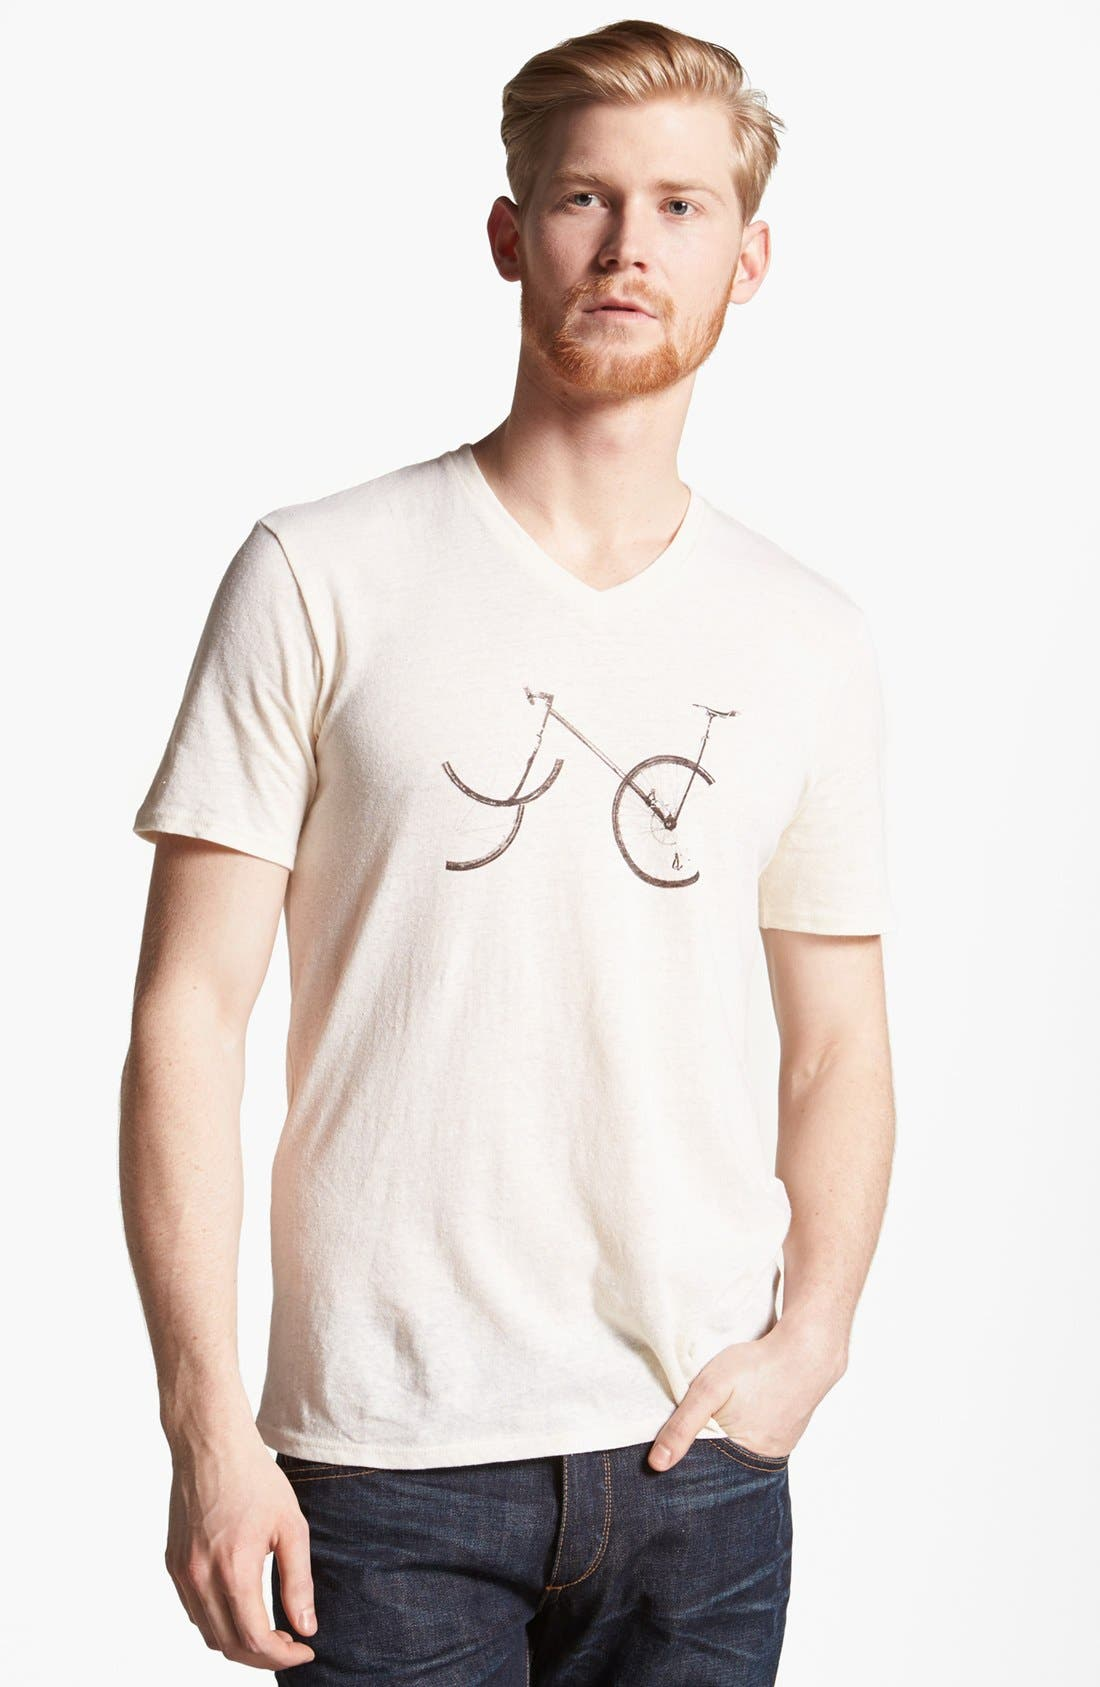 Alternate Image 1 Selected - Rogan 'NYC Bike' Graphic V-Neck T-Shirt